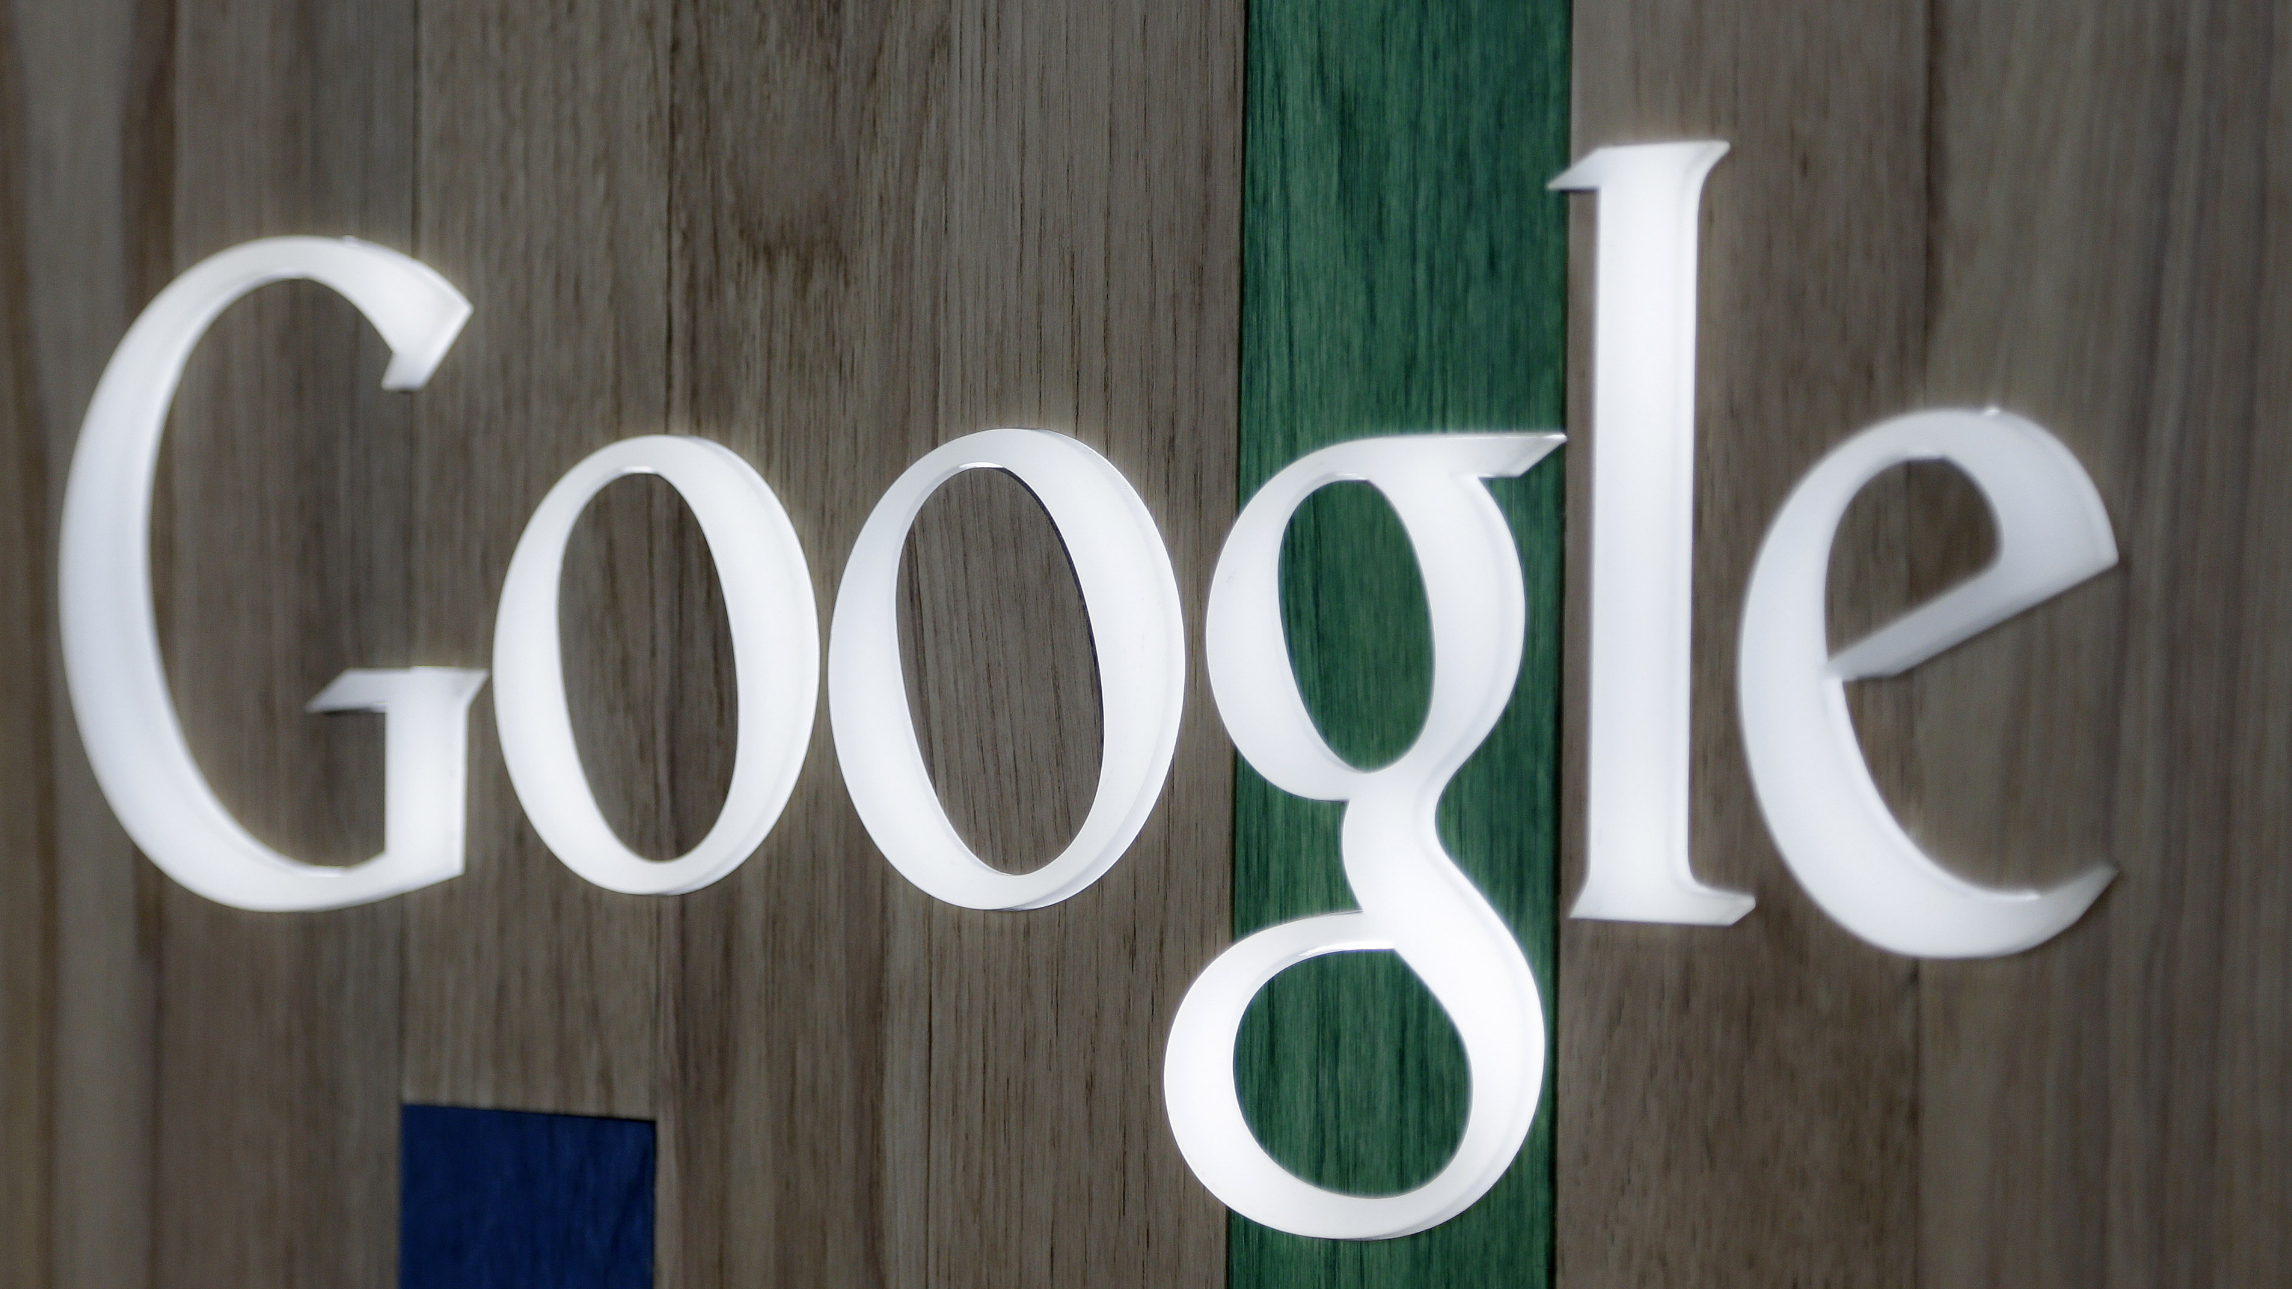 GoogleGrain.jpg